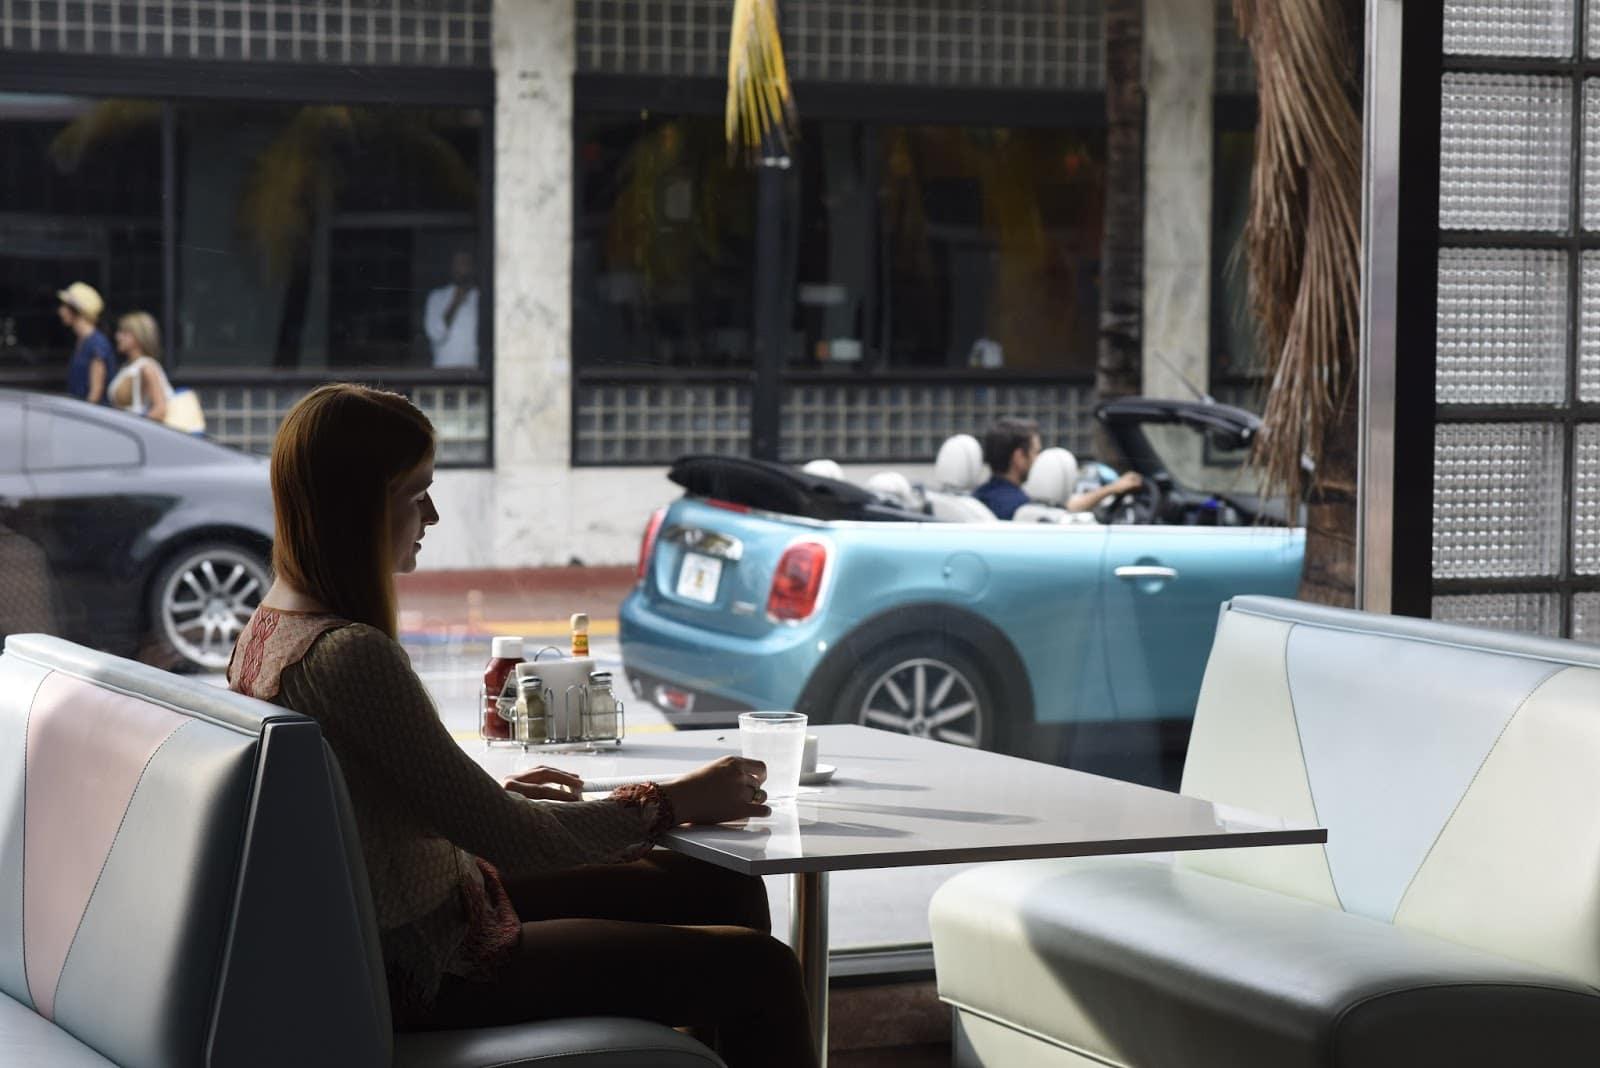 P90209648 highRes jake and the new min Με μία ταινία μικρού μήκους διαφημίζεται το νέο MINI Cabrio Advertorial, videos, Μινι, ΜΙΝΙ Cabrio